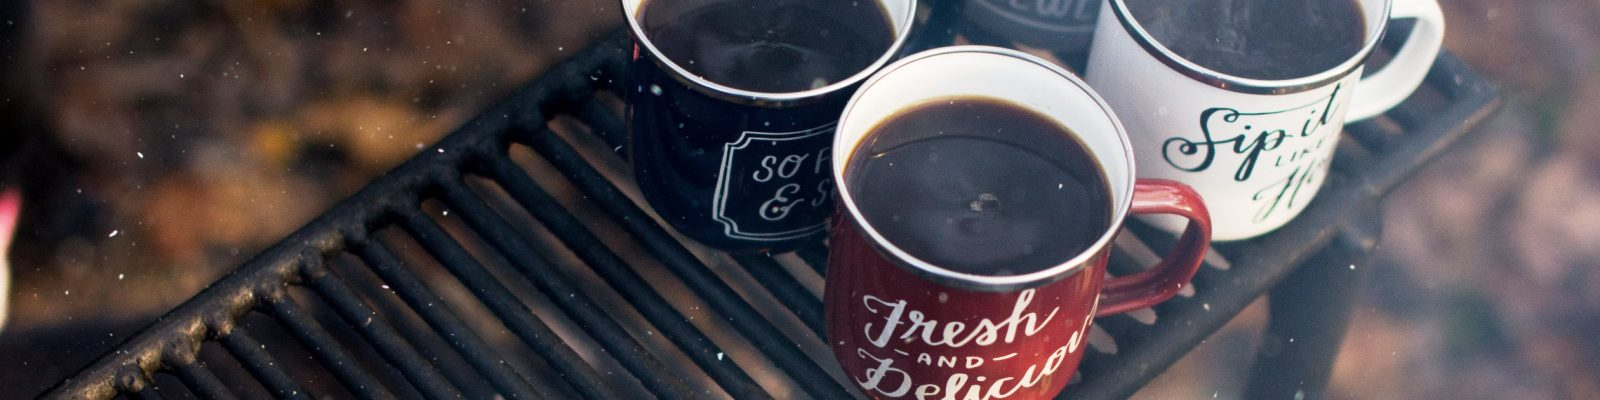 cropped-coffeecups2-19.jpg